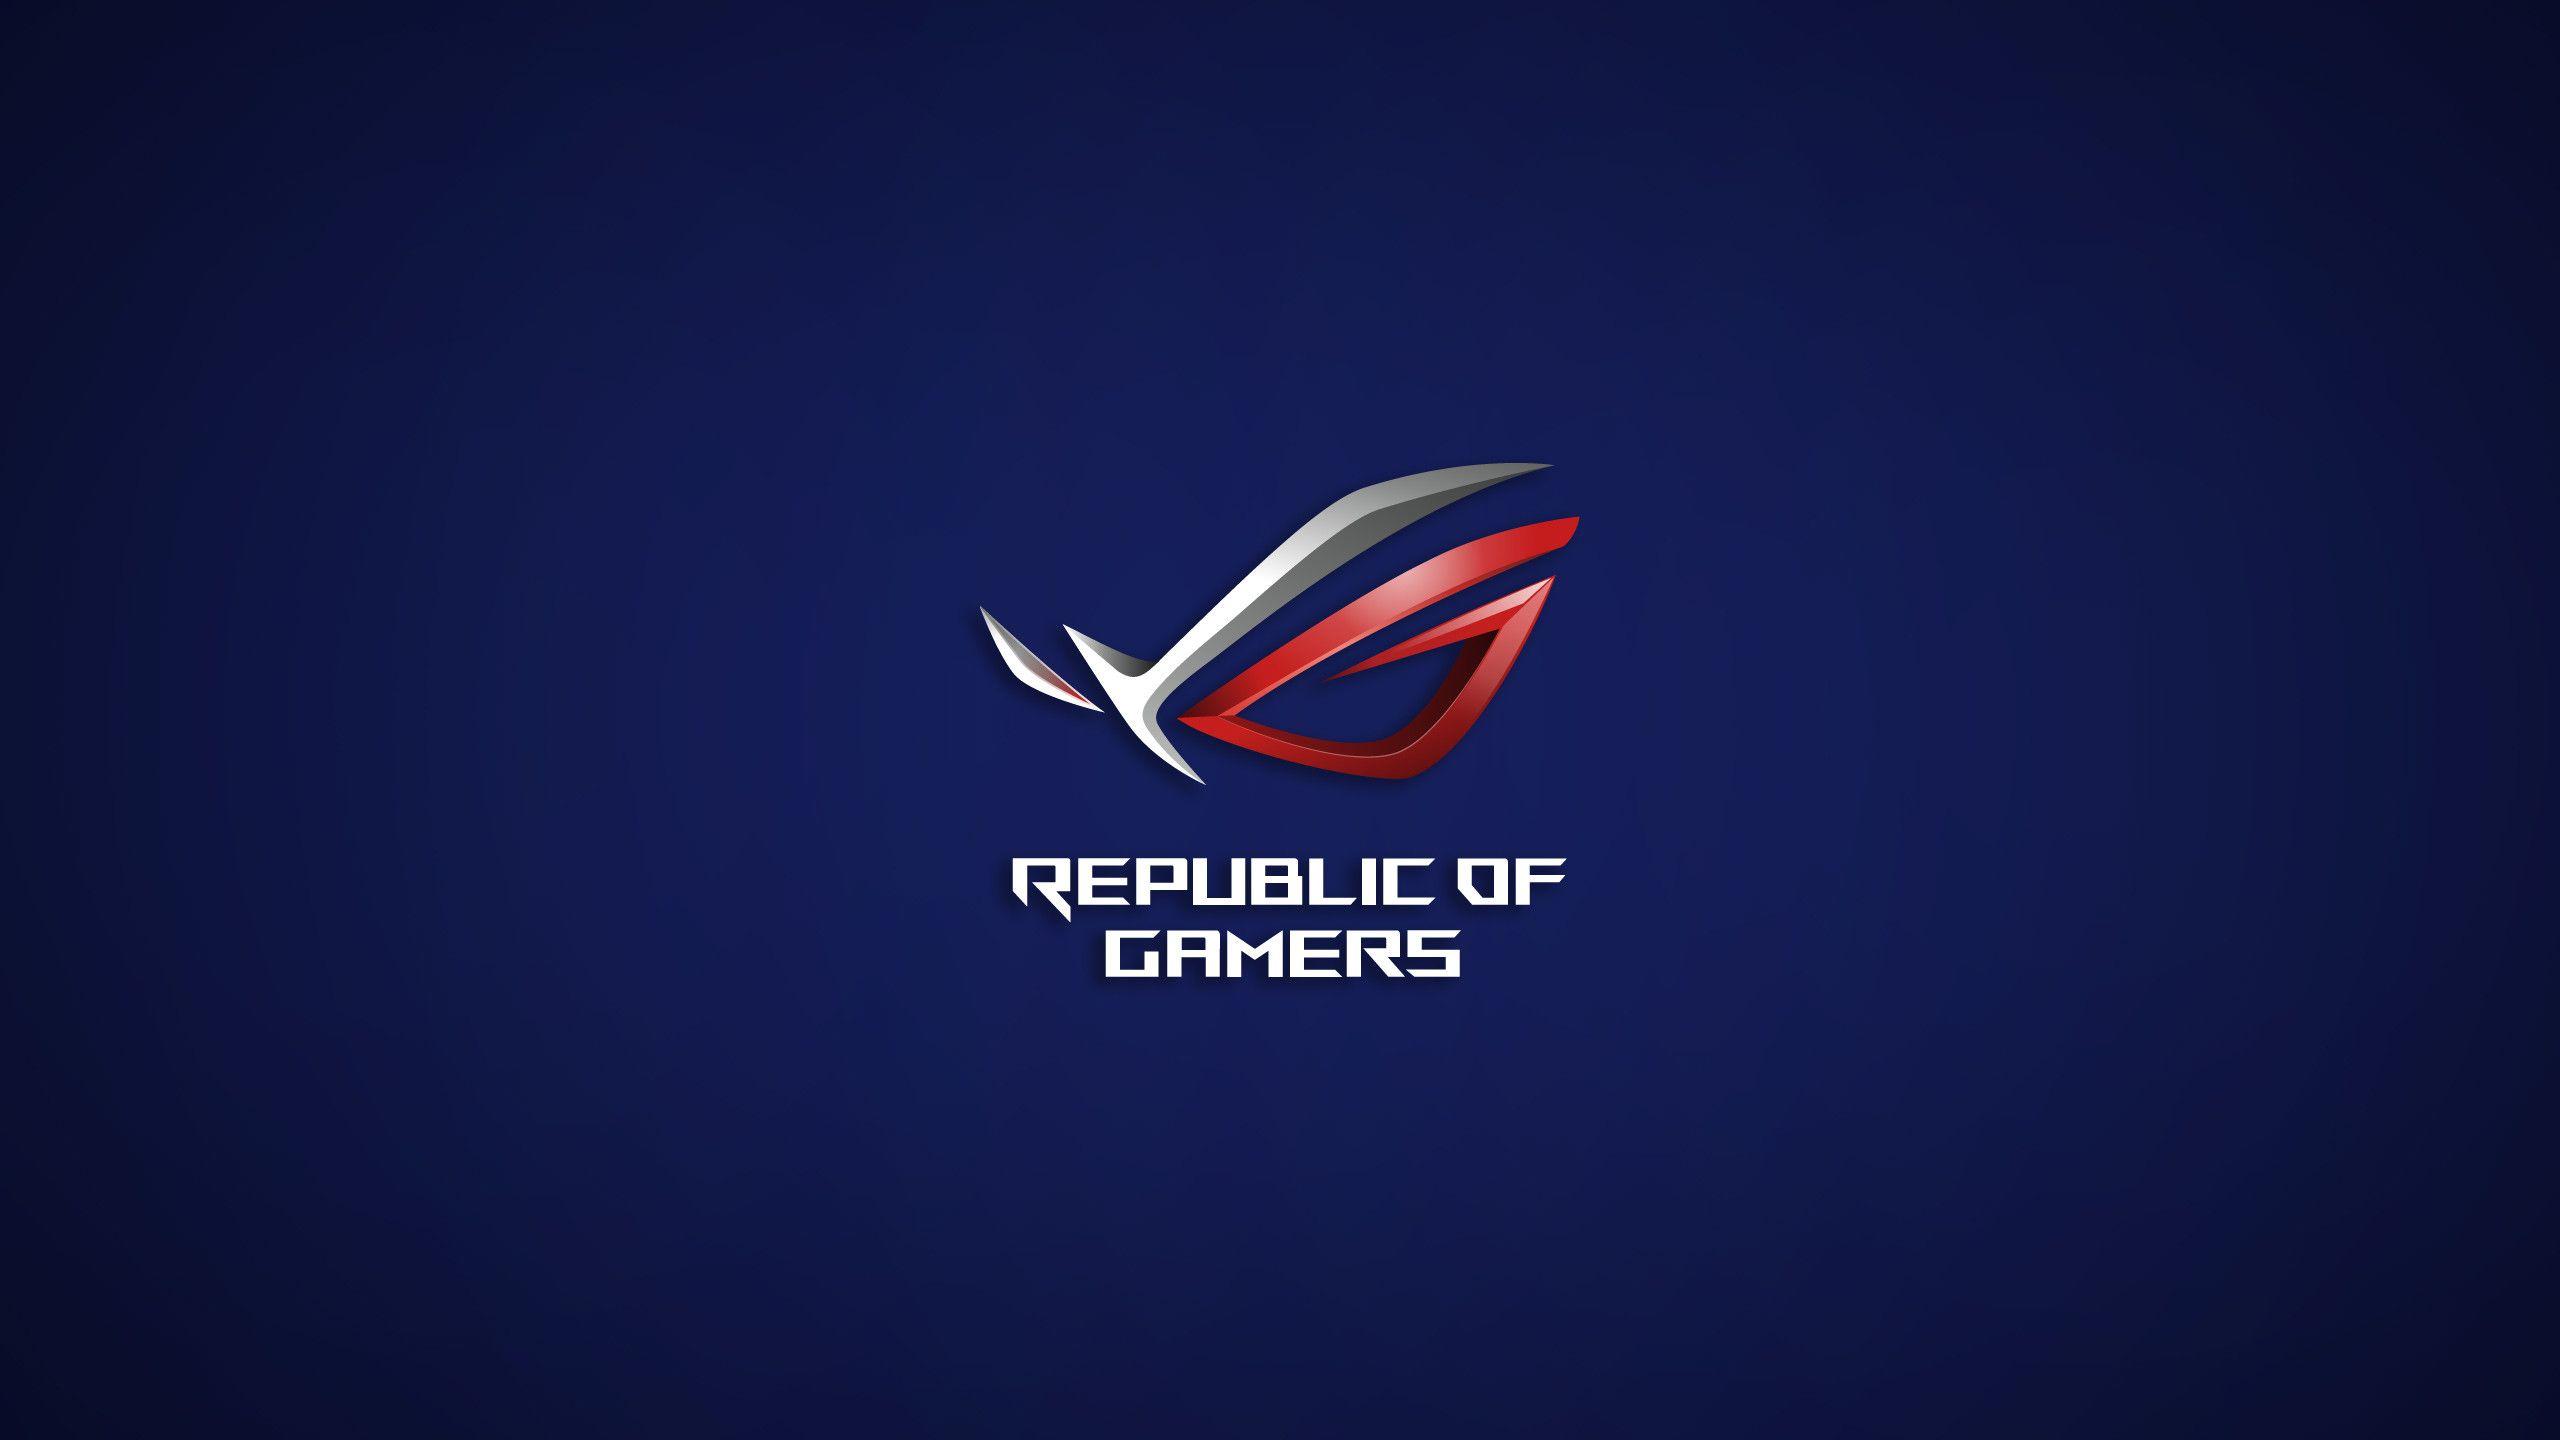 2560x1440 Rog Asus Republic Of Gamers Wallpaper Is